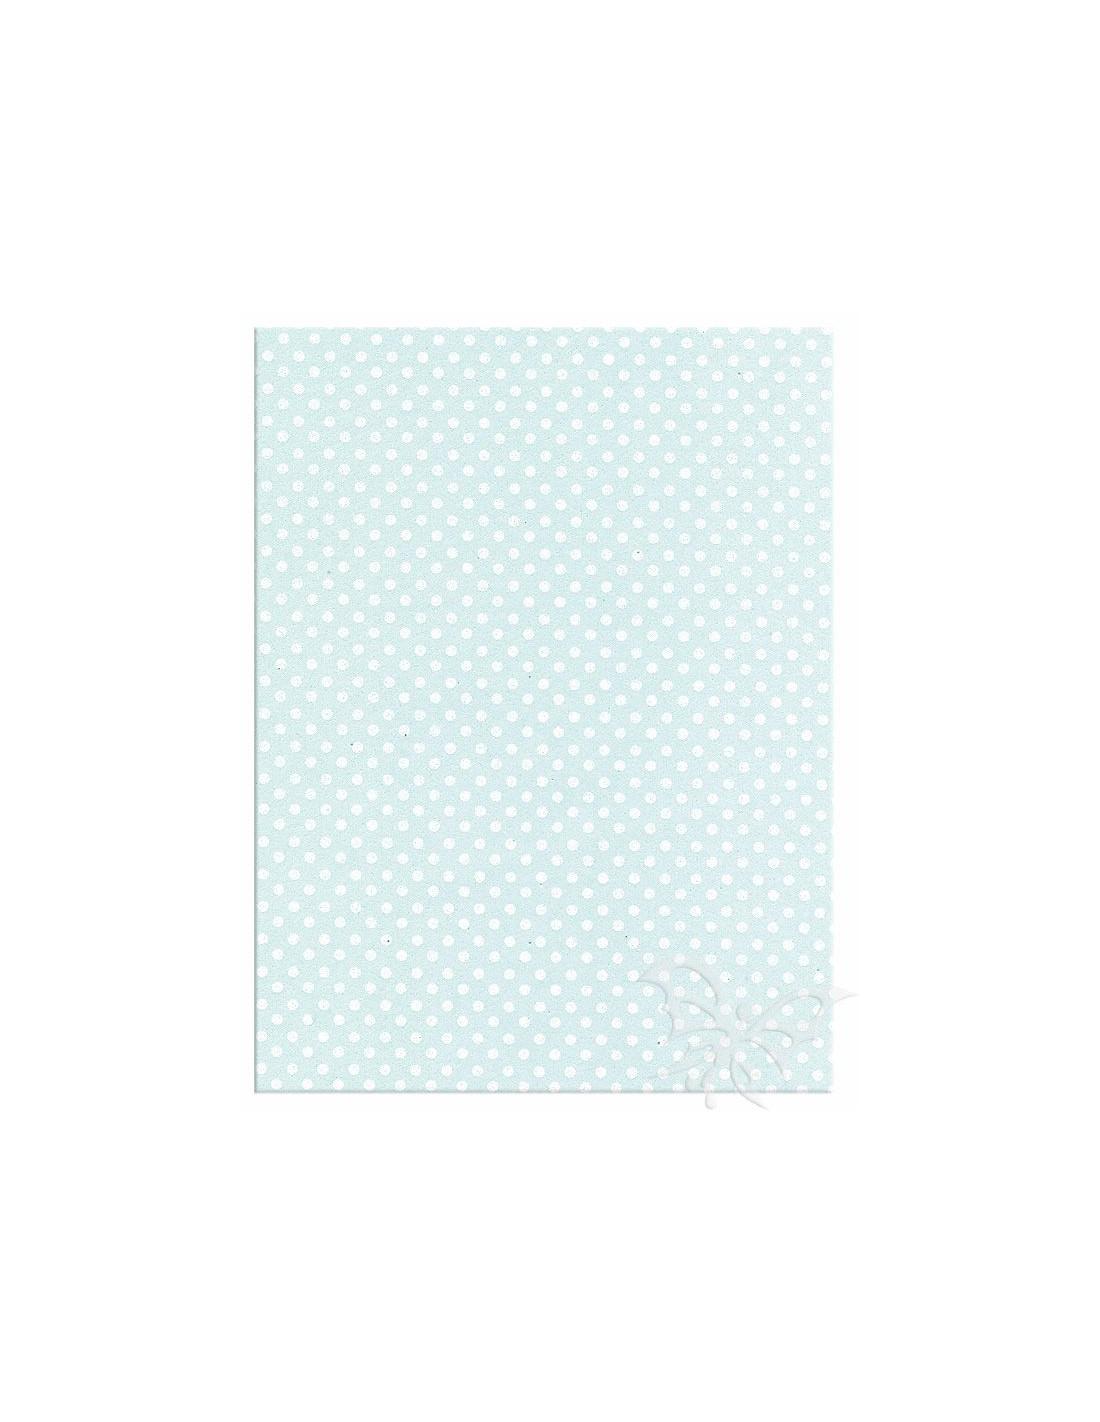 Foglio moosgummi pois azzurro pastello bianco loading zoom jpg 800x800  Moosgummi 40x60cm 5e753ff9770